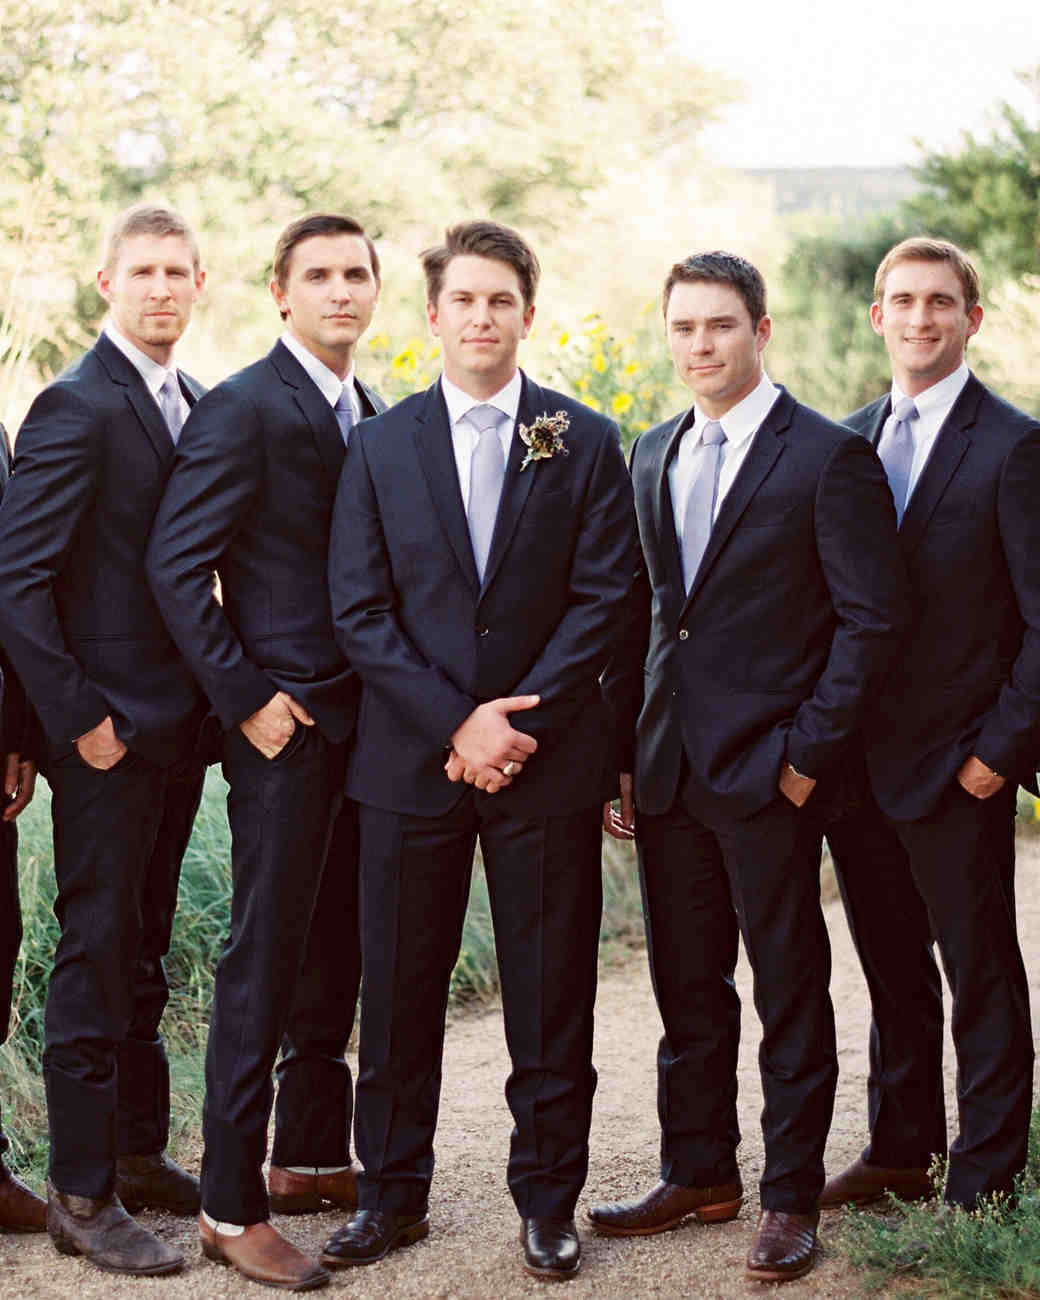 kelsey jacob wedding groomsmen black tuxes